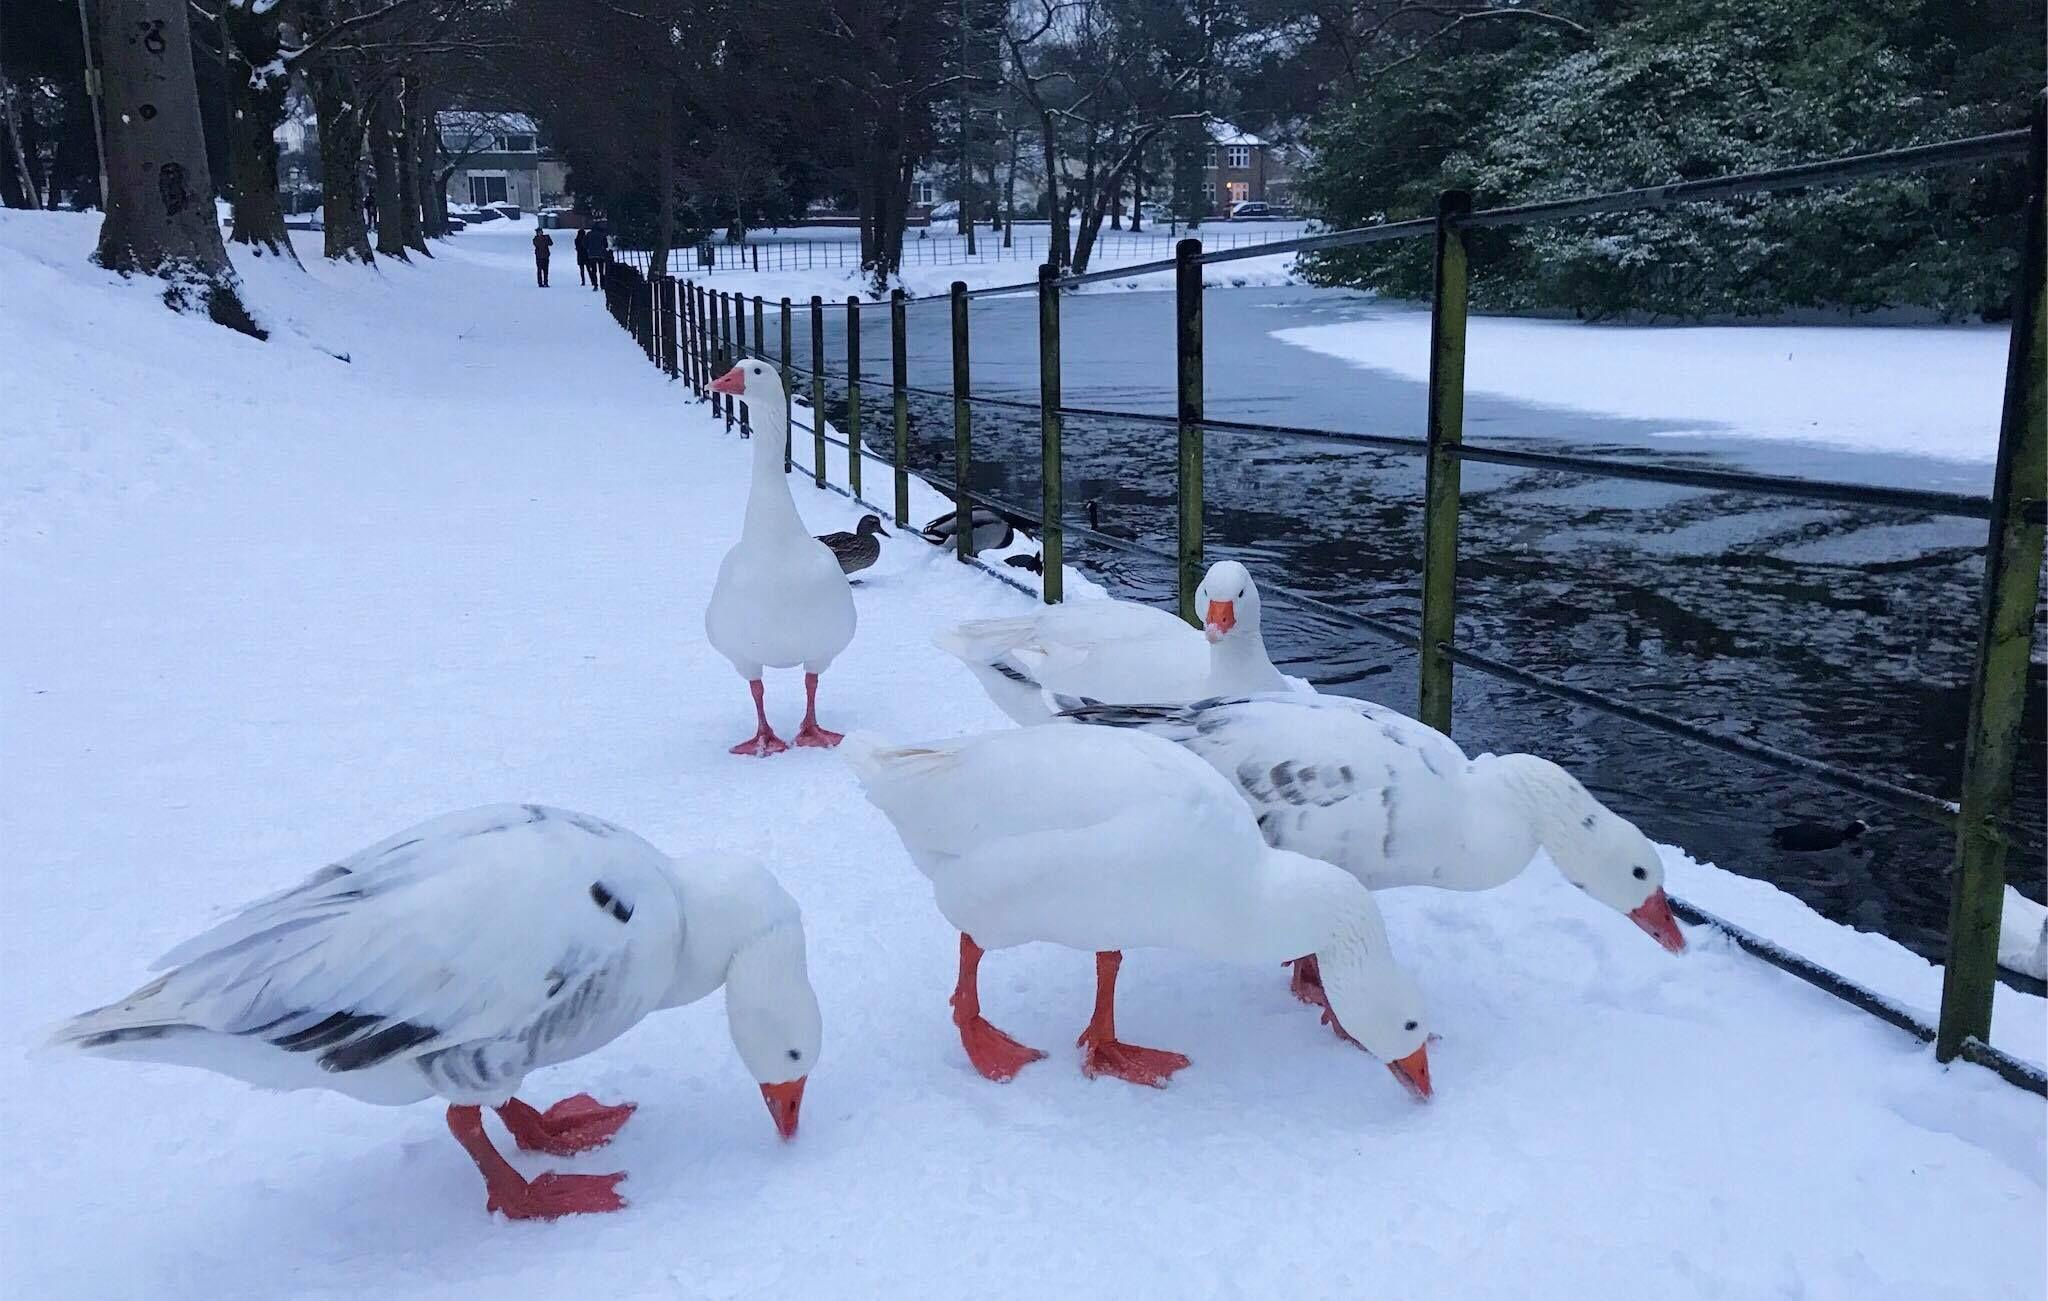 Image may contain: Ptarmigan, Grouse, Bird, Animal, Fence, Sports, Sport, Snow, Skiing, Outdoors